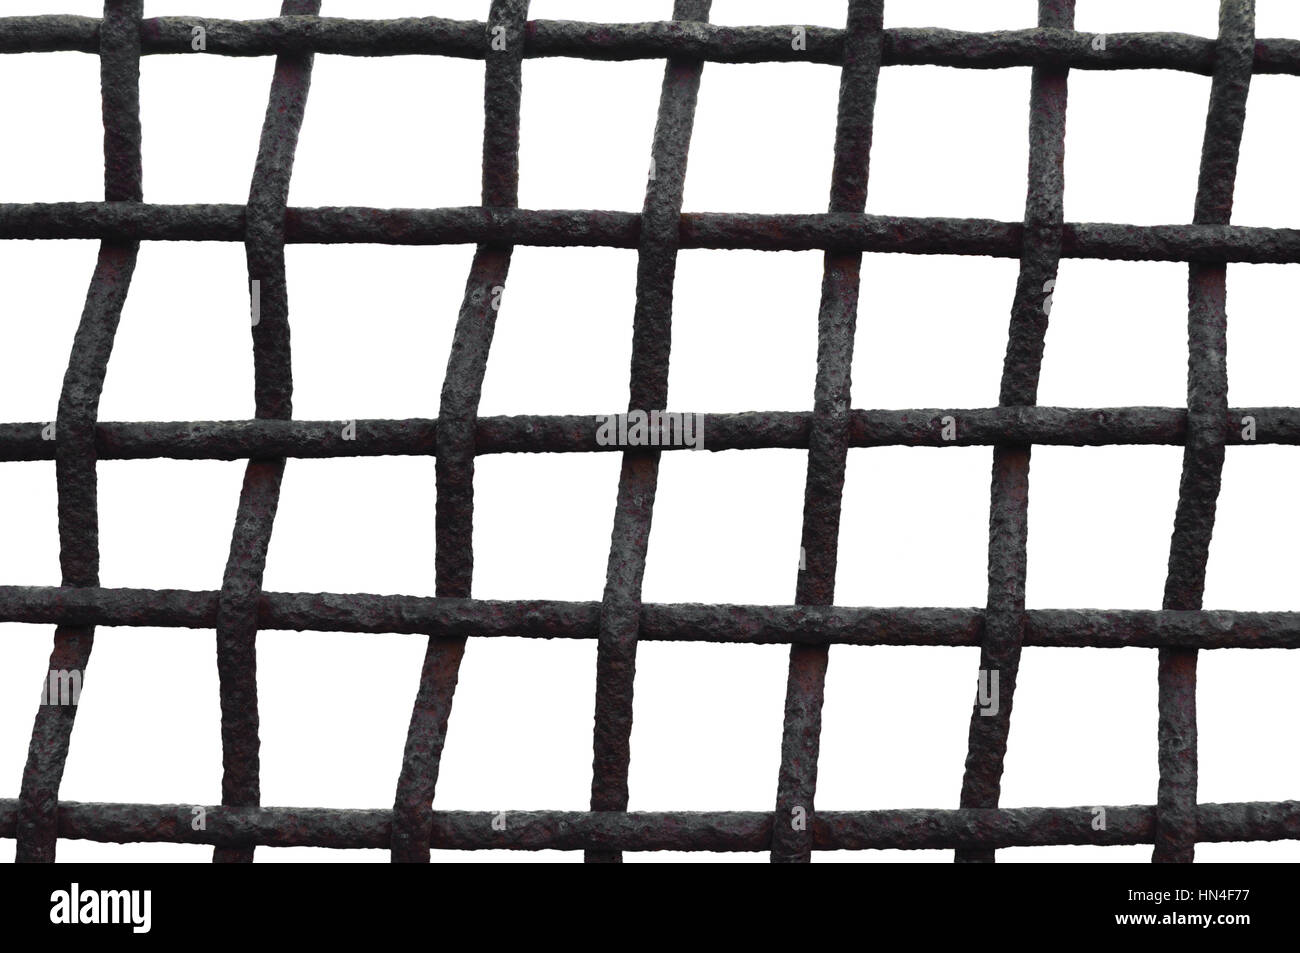 Old Aged Weathered Rusty Grid Cage Fence Iron Grating, Isolated Grungy Horizontal Large Detailed Macro Closeup, Stock Photo